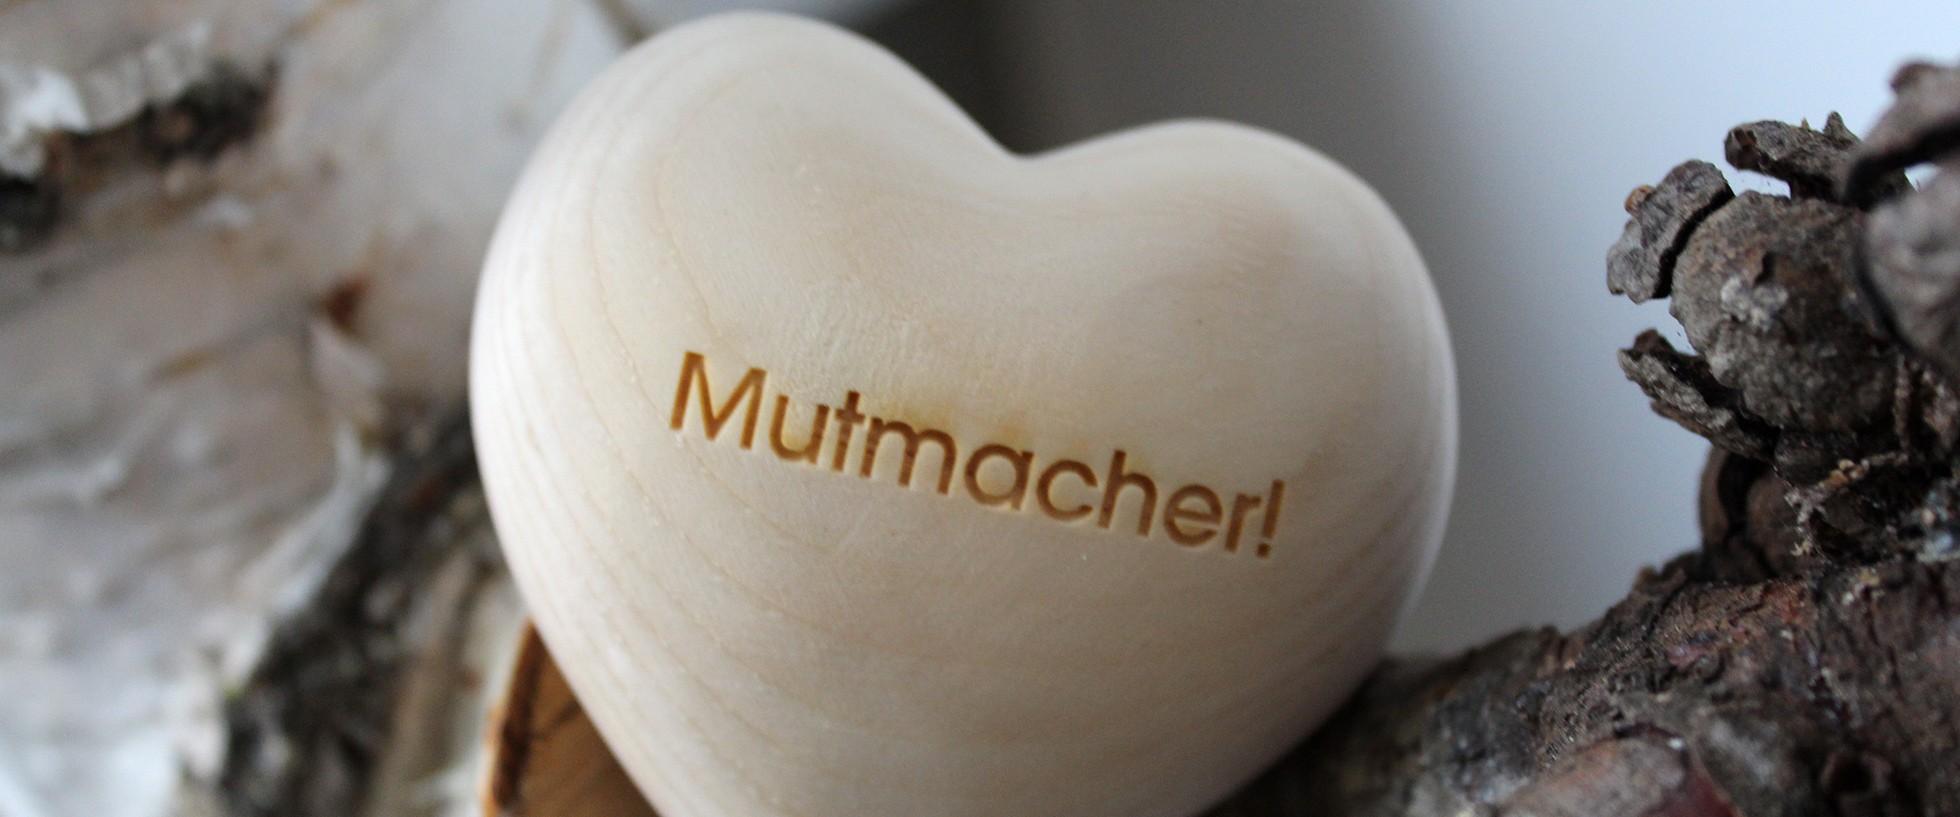 "ThankGoods, Giving, Holzherz ""Mutmacher!"""